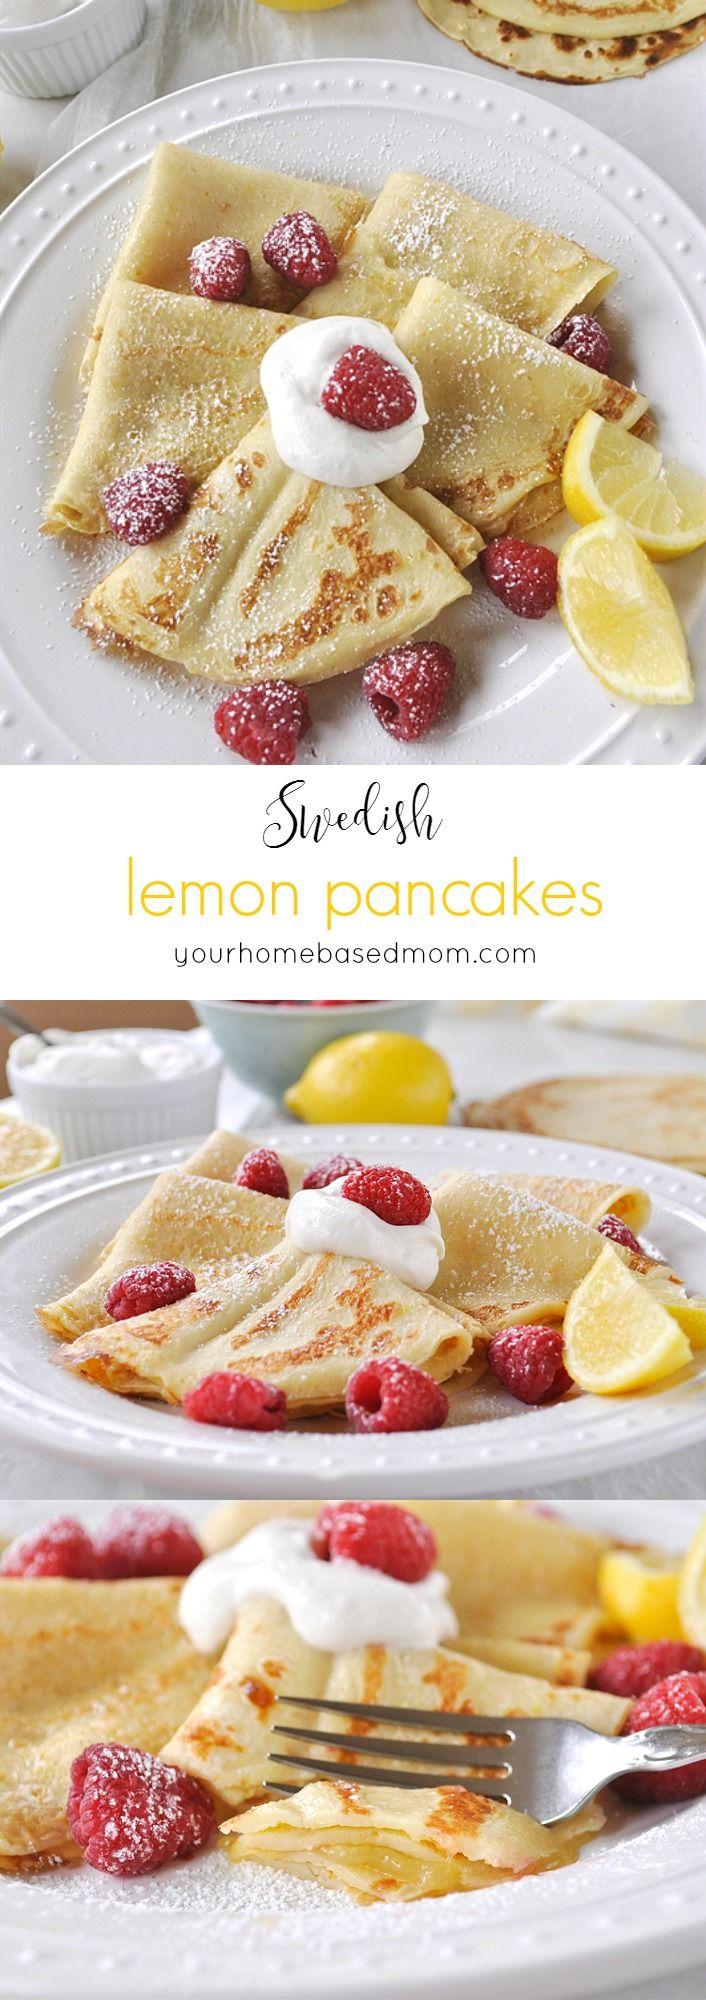 Swedish Lemon Pancakes recipes. Surprise your family with this fabulously spring breakfast recipe! yourhomebasedmom.com for thirtyhandmadedays.com